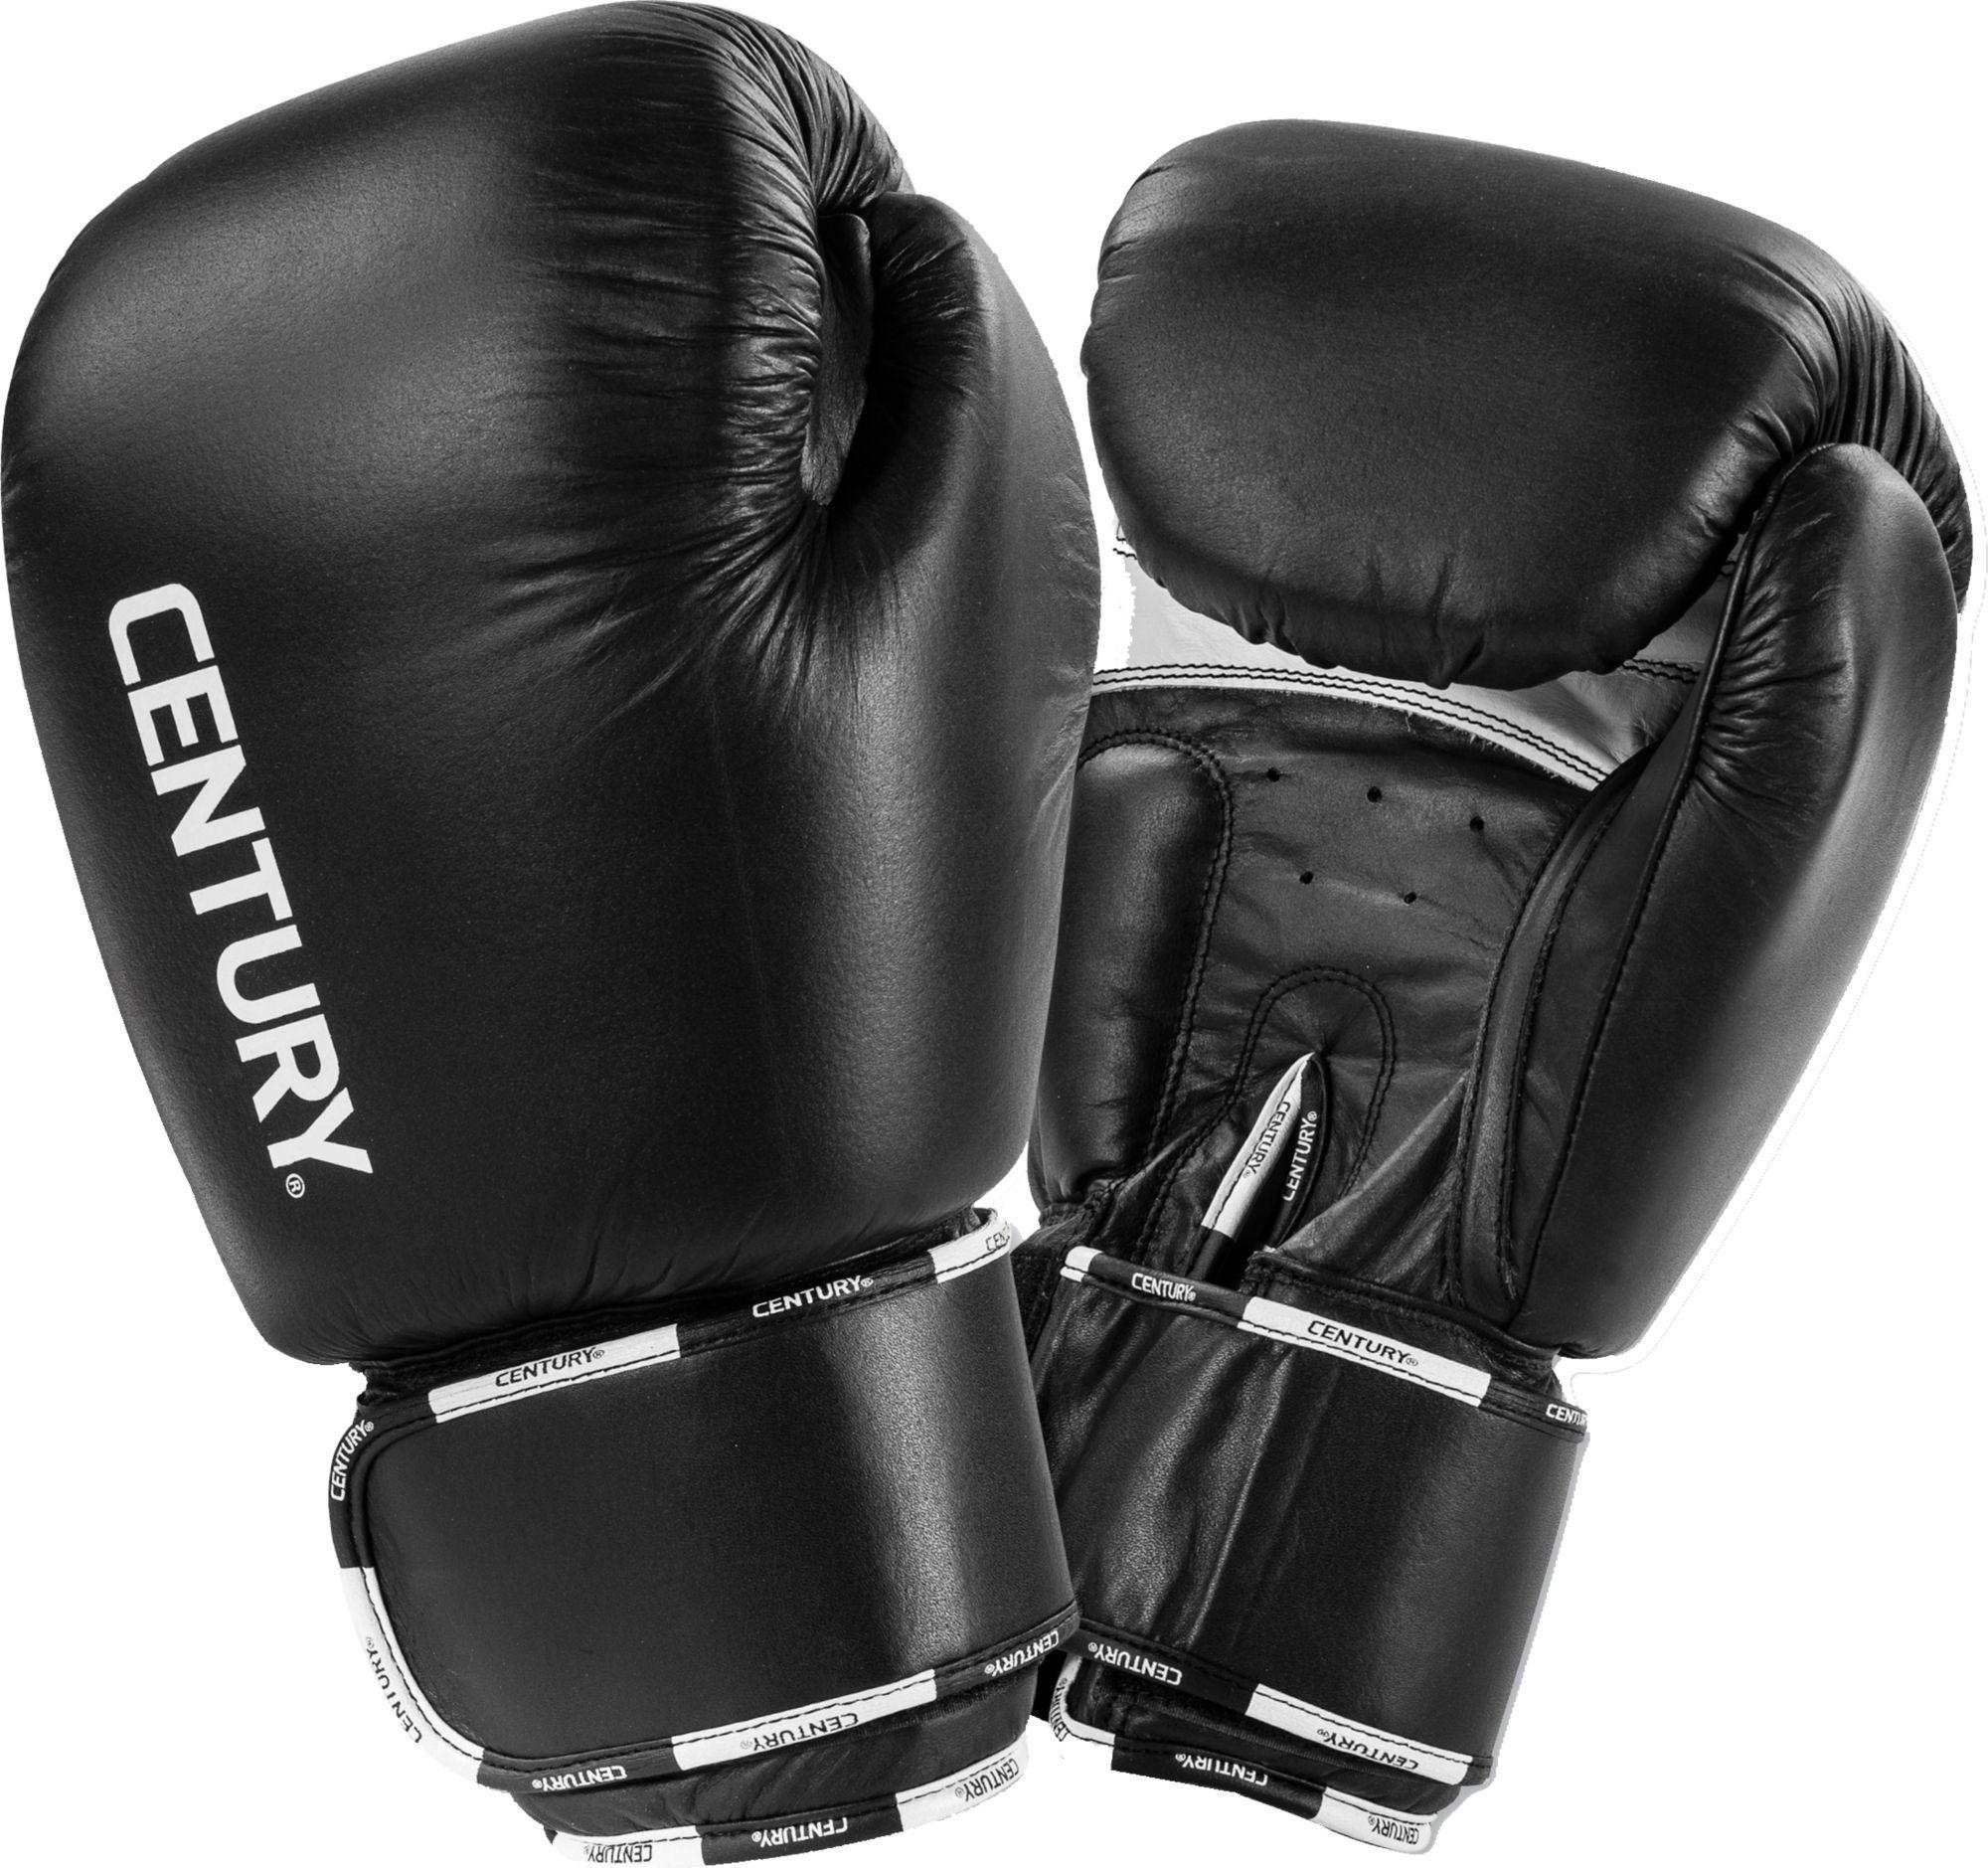 Sporting Goods Wesing new boxing gloves for men punch bag gloves MMA Training Sparring gloves